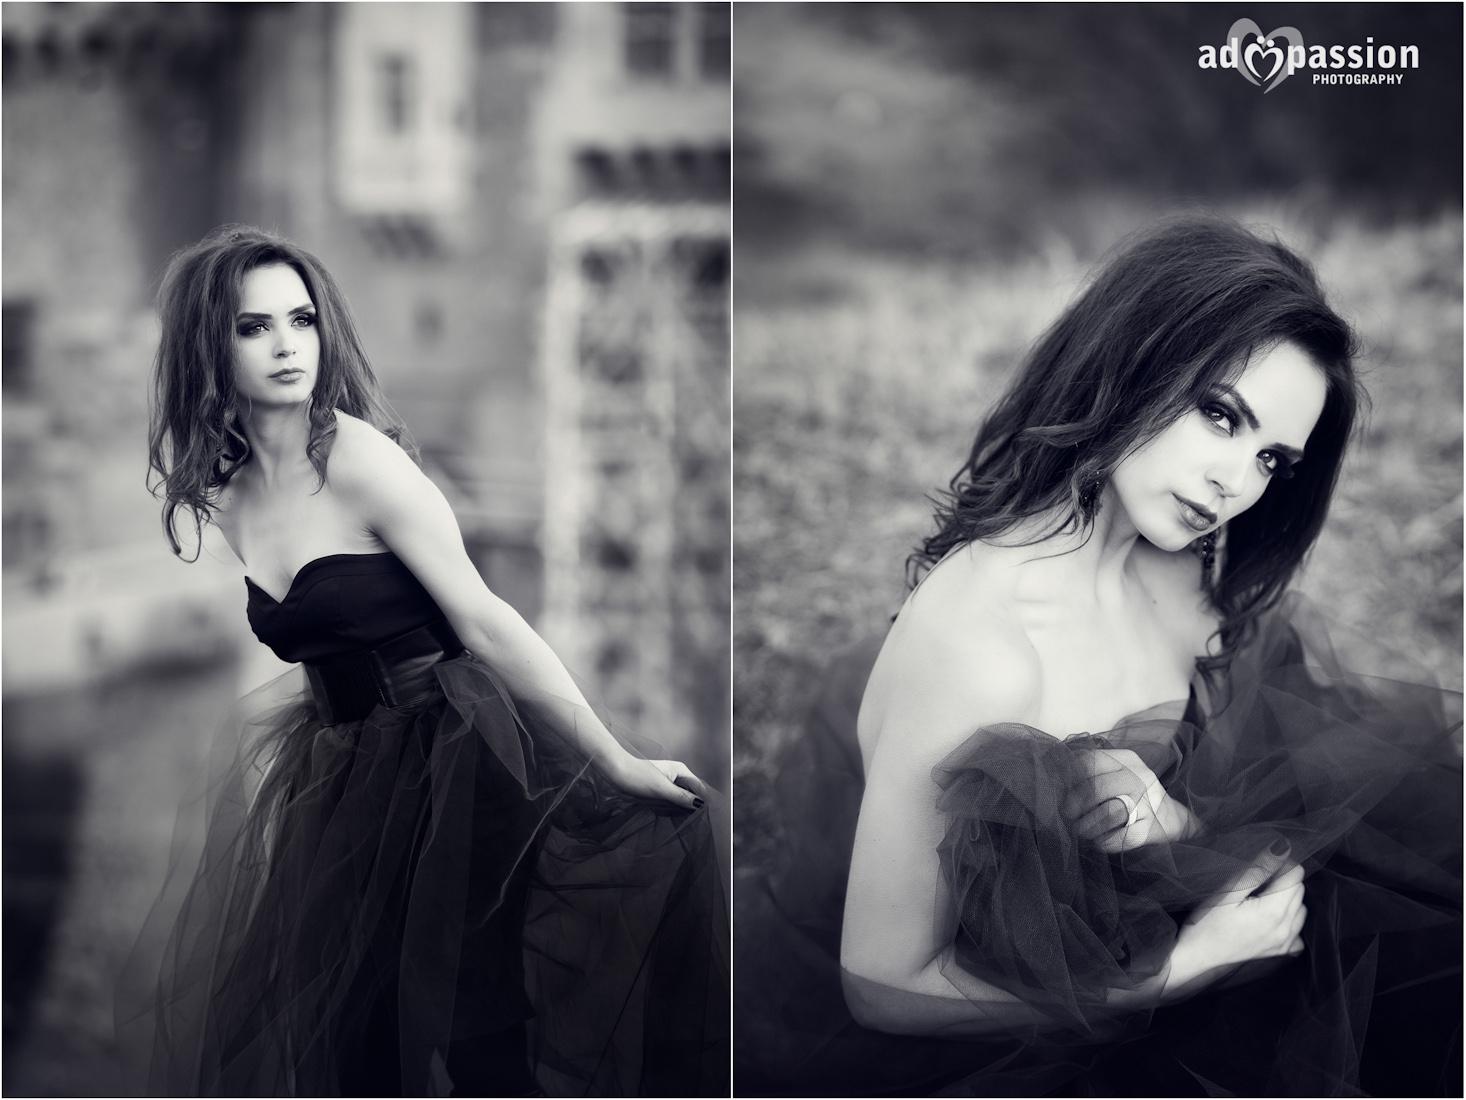 AD Passion Photography | alexandra_castelul_huniazilor_005 | Adelin, Dida, fotograf profesionist, fotograf de nunta, fotografie de nunta, fotograf Timisoara, fotograf Craiova, fotograf Bucuresti, fotograf Arad, nunta Timisoara, nunta Arad, nunta Bucuresti, nunta Craiova